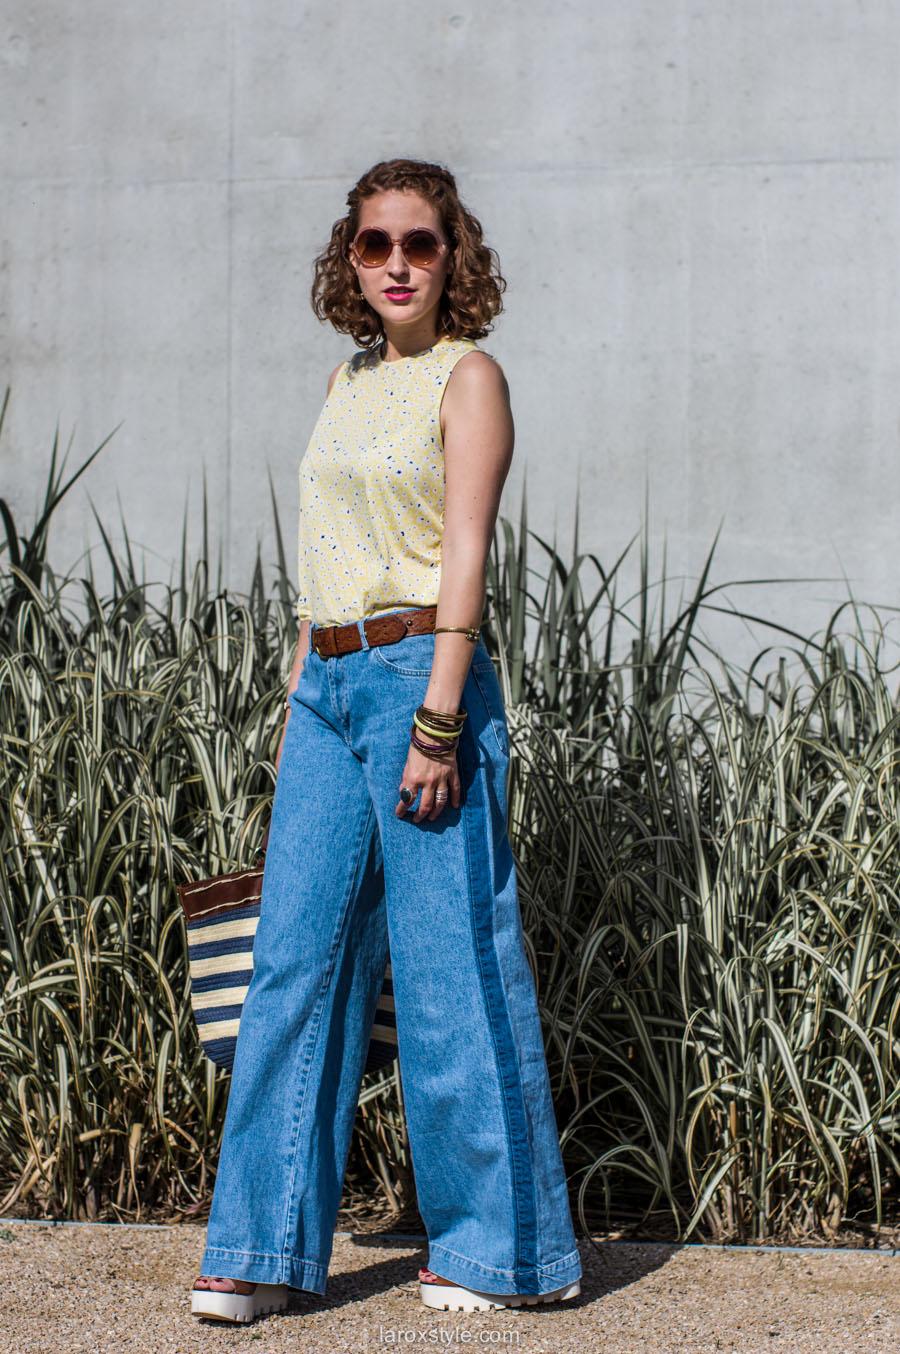 laroxstyle - blog mode lyon - look 70s - pantalon patte d elephant (8 sur 44)